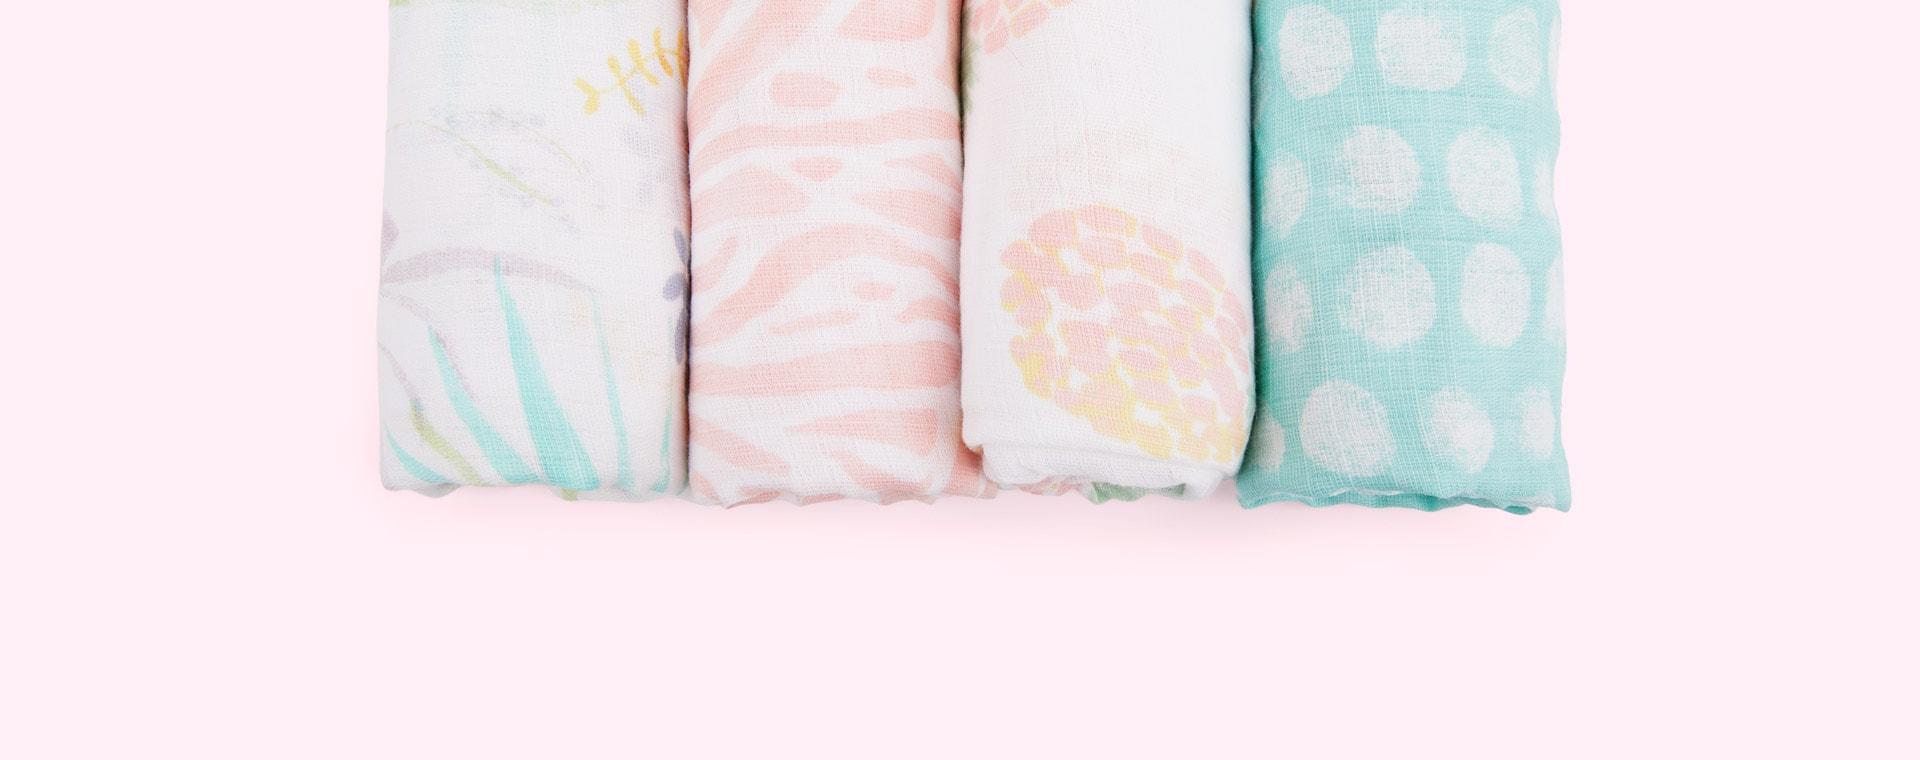 Tropicalia aden + anais 4-Pack Essentials Cotton Muslin Swaddle Blanket